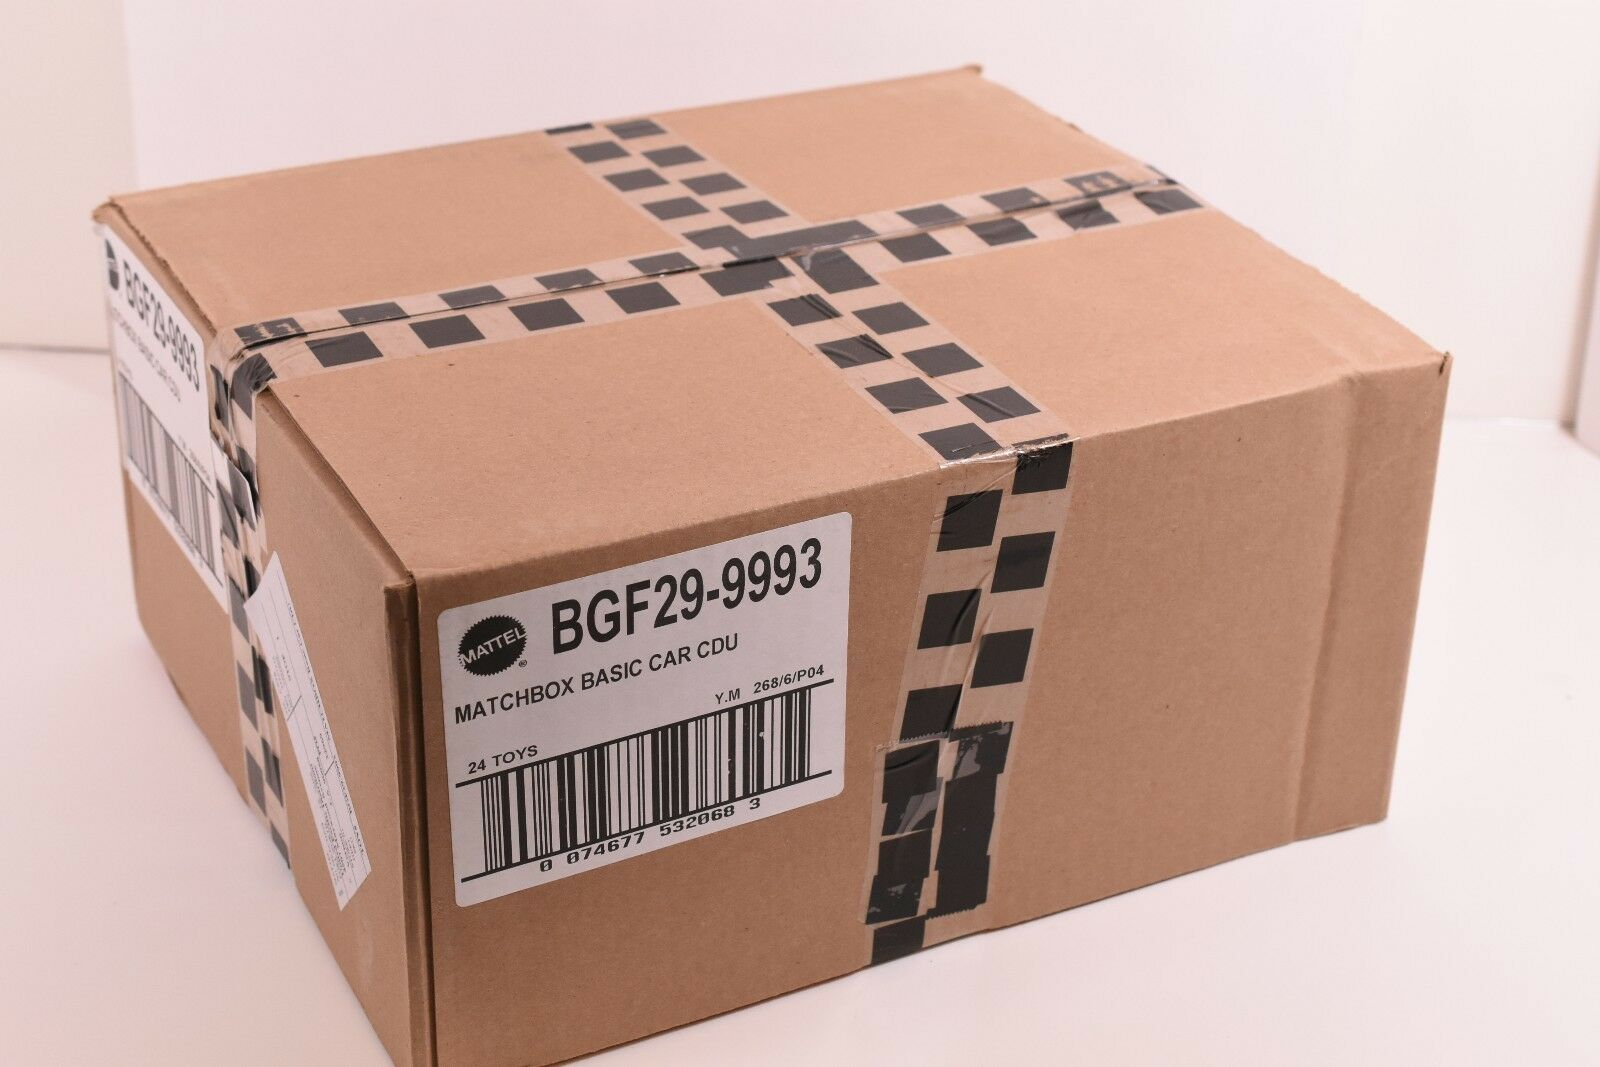 Bgf299993 Mattel Matchbox Básico Coche en un Pansize Unidad Máster Box 24 Cars